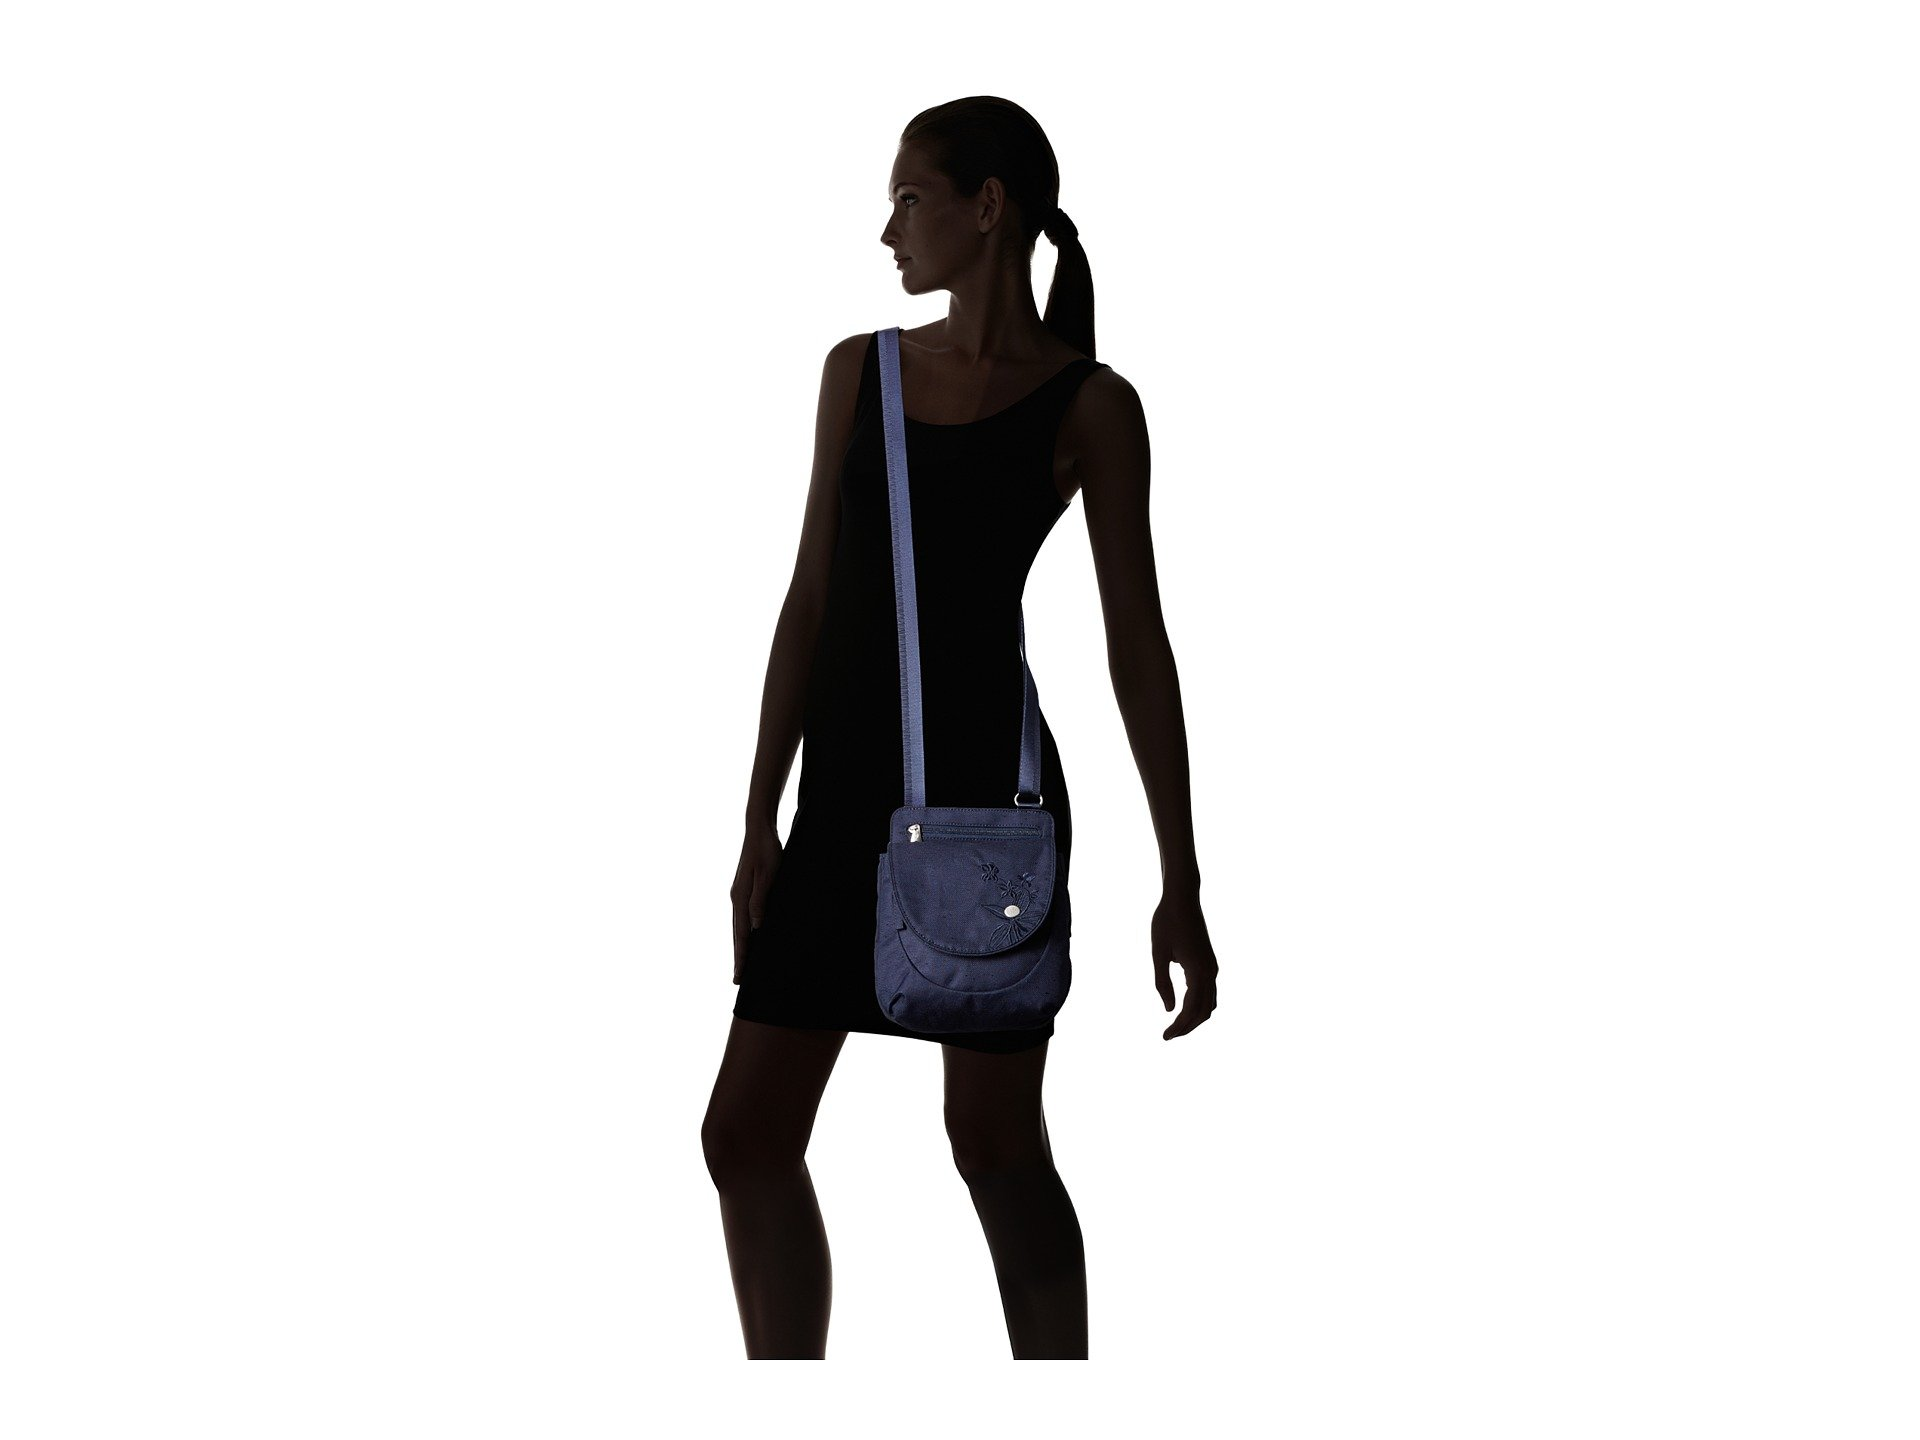 Midnight Swift Grab Haiku Bag Bag Haiku Grab Swift Grab Swift Haiku Midnight Bag wxXHaCxUq